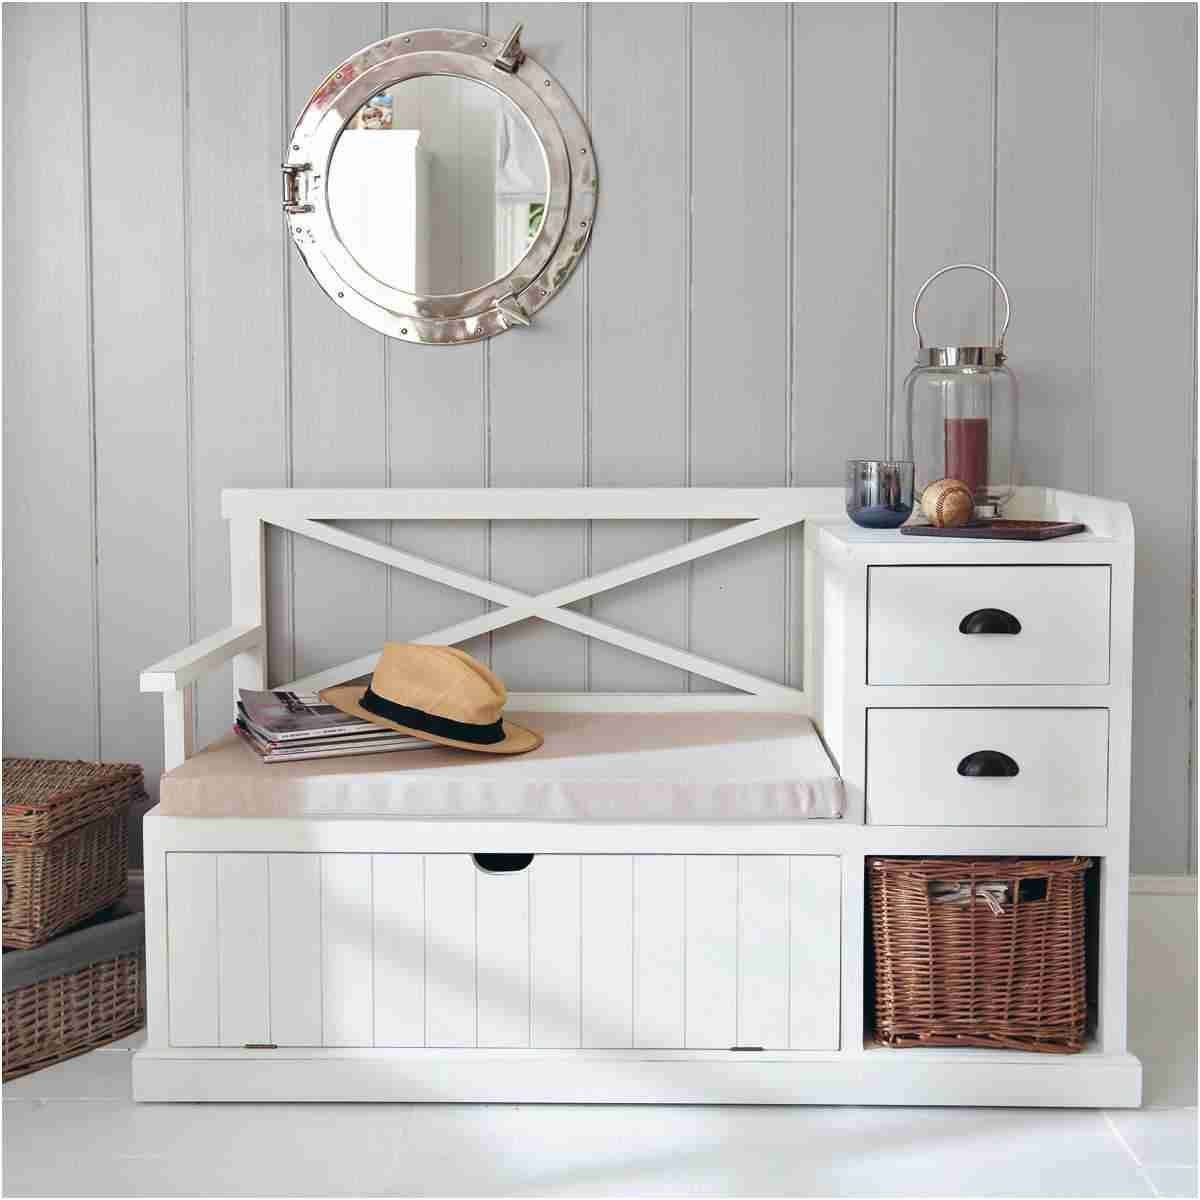 Meuble Entree Maison Luxe Meuble D Entree Range Chaussures Table De Entree Maison Meuble Hallway Furniture Home Decor Home Furniture